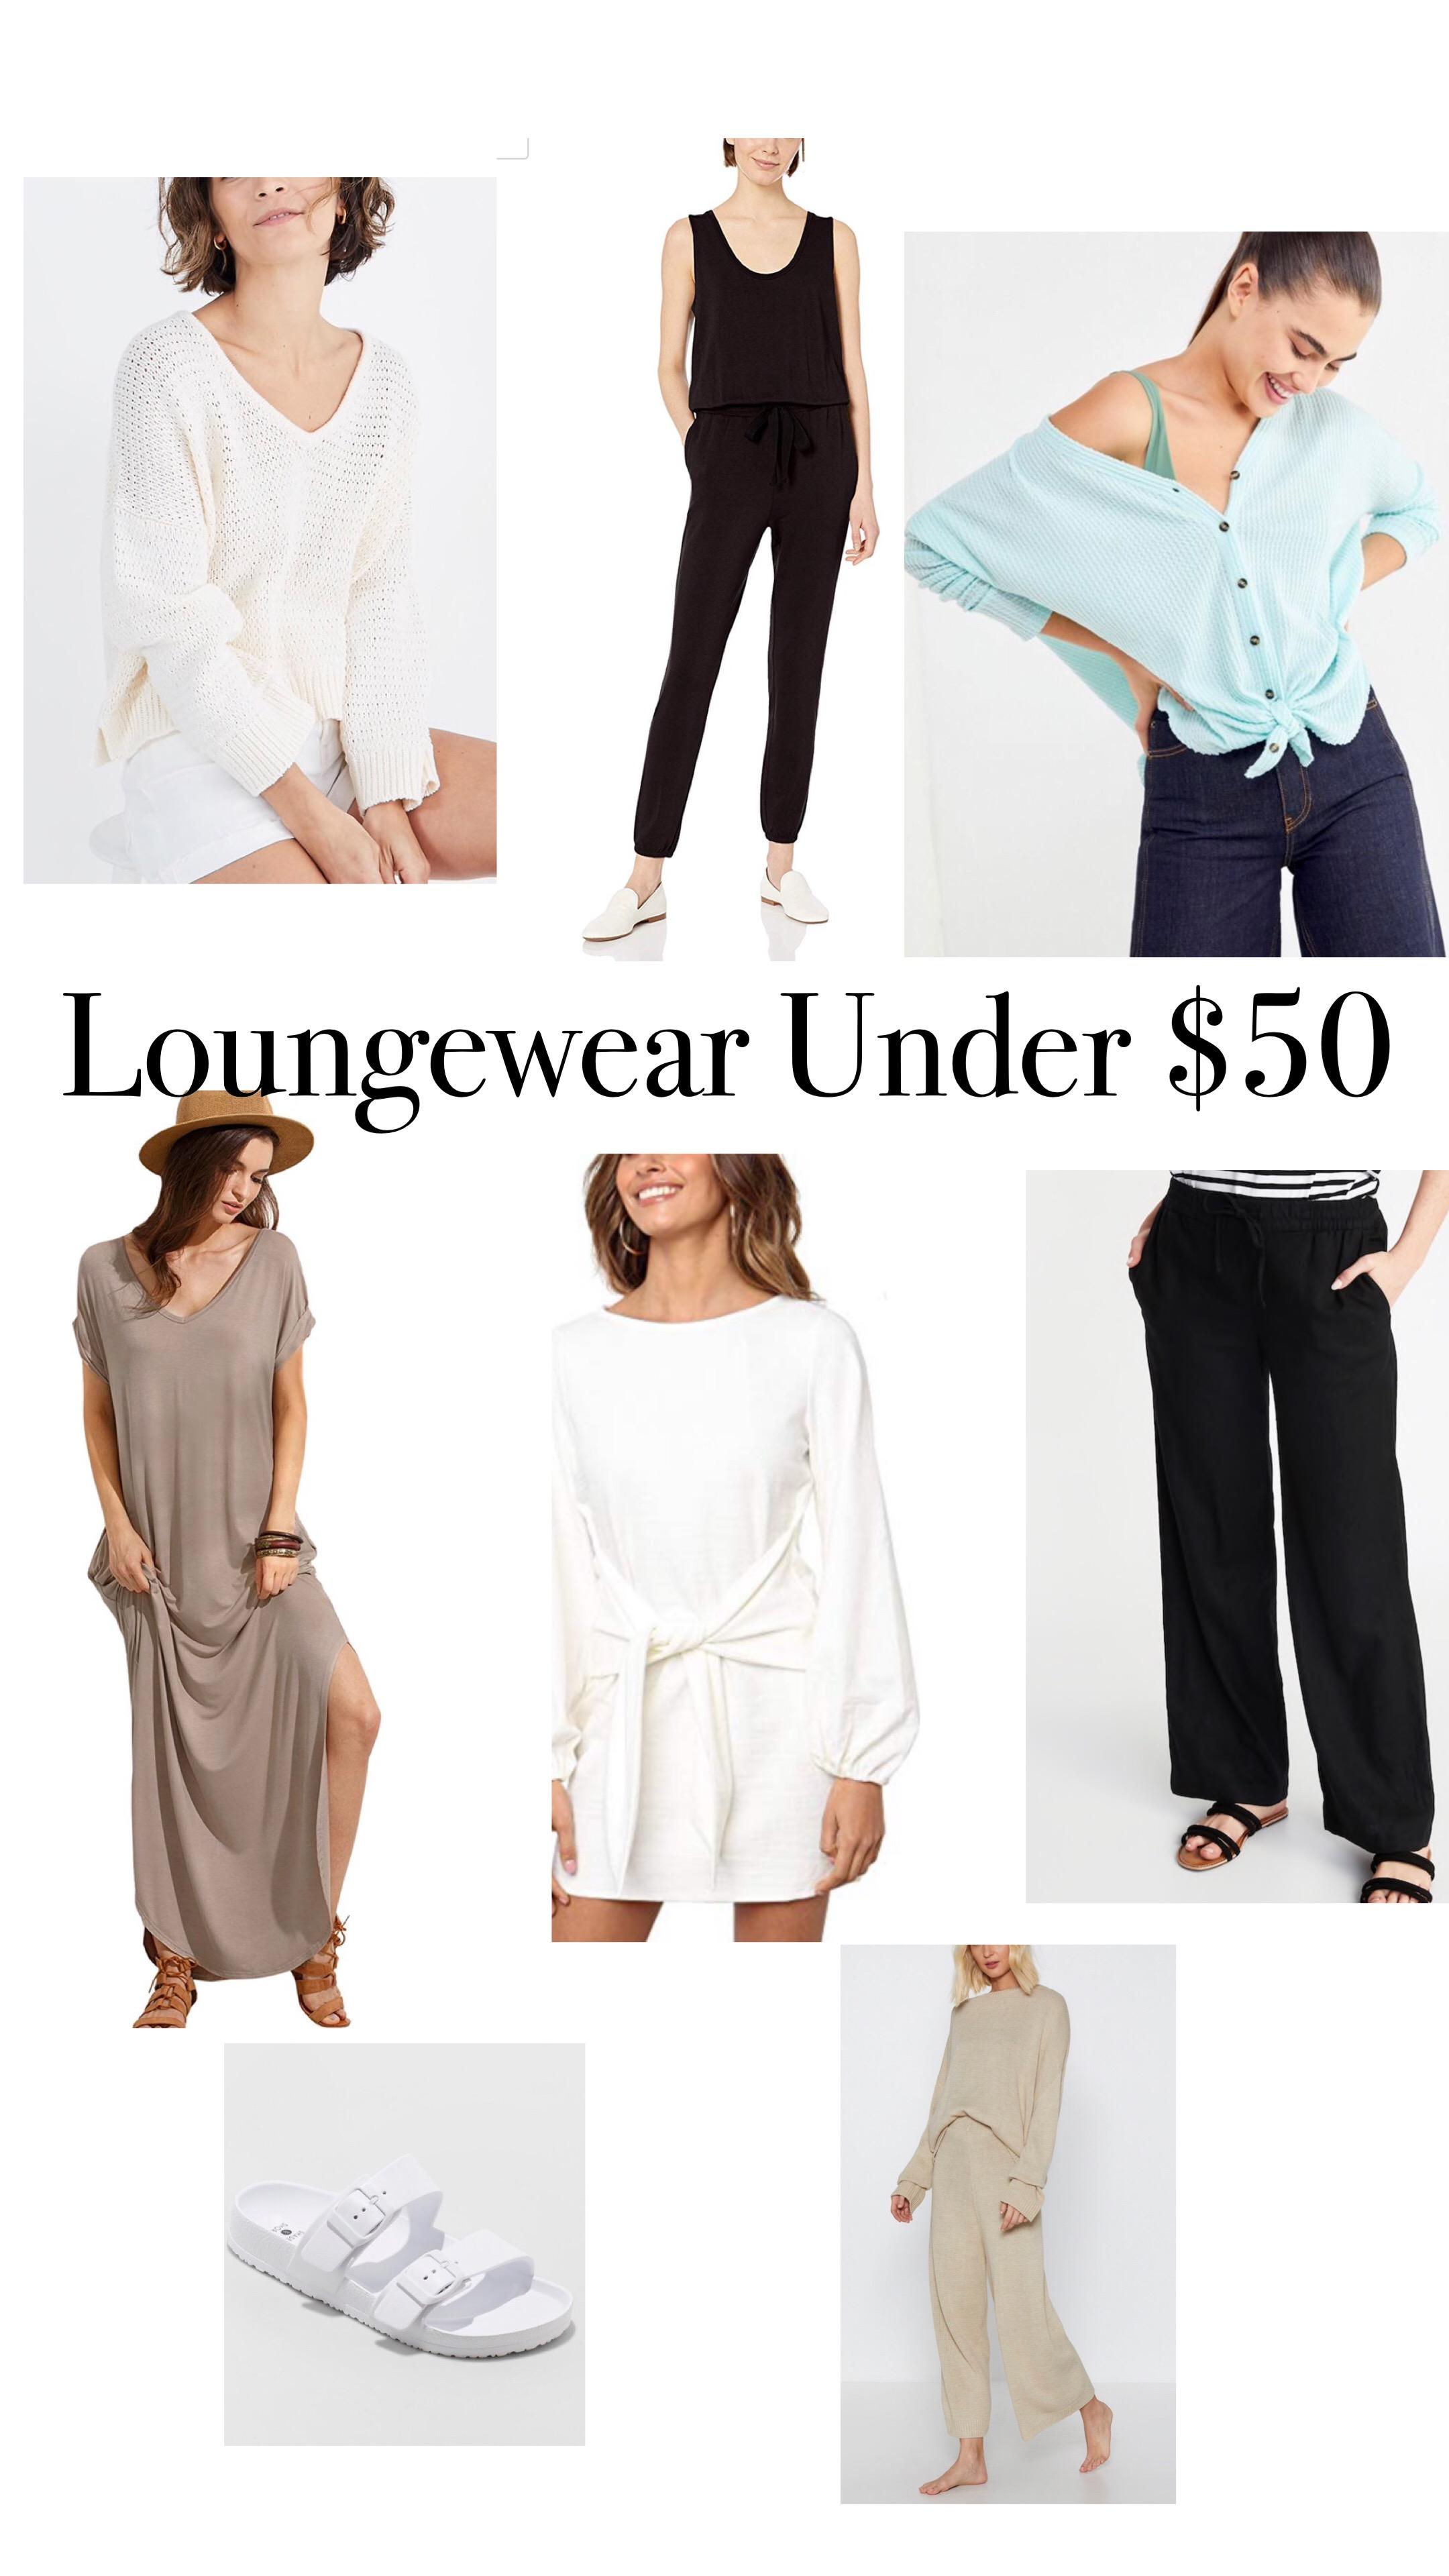 Loungewear Under $50- Karama by Hoda